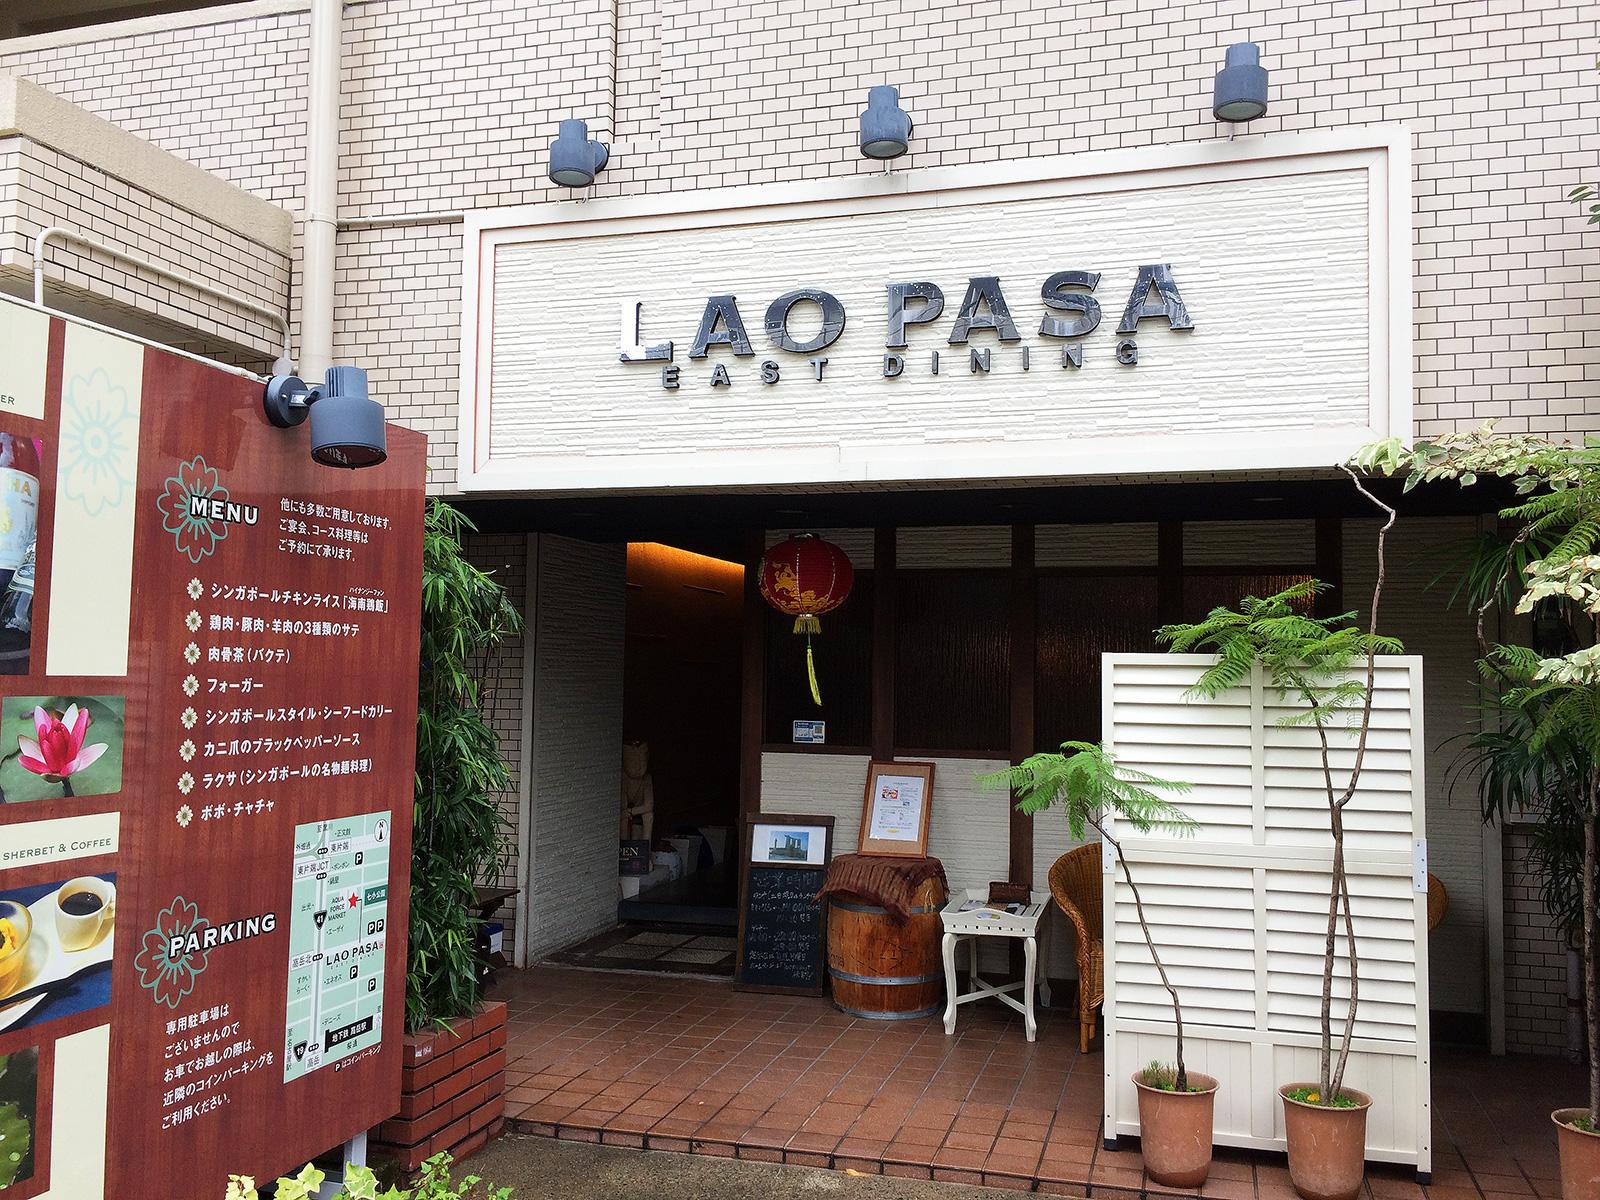 「LAO PASA」の海南鶏飯ランチ @高岳